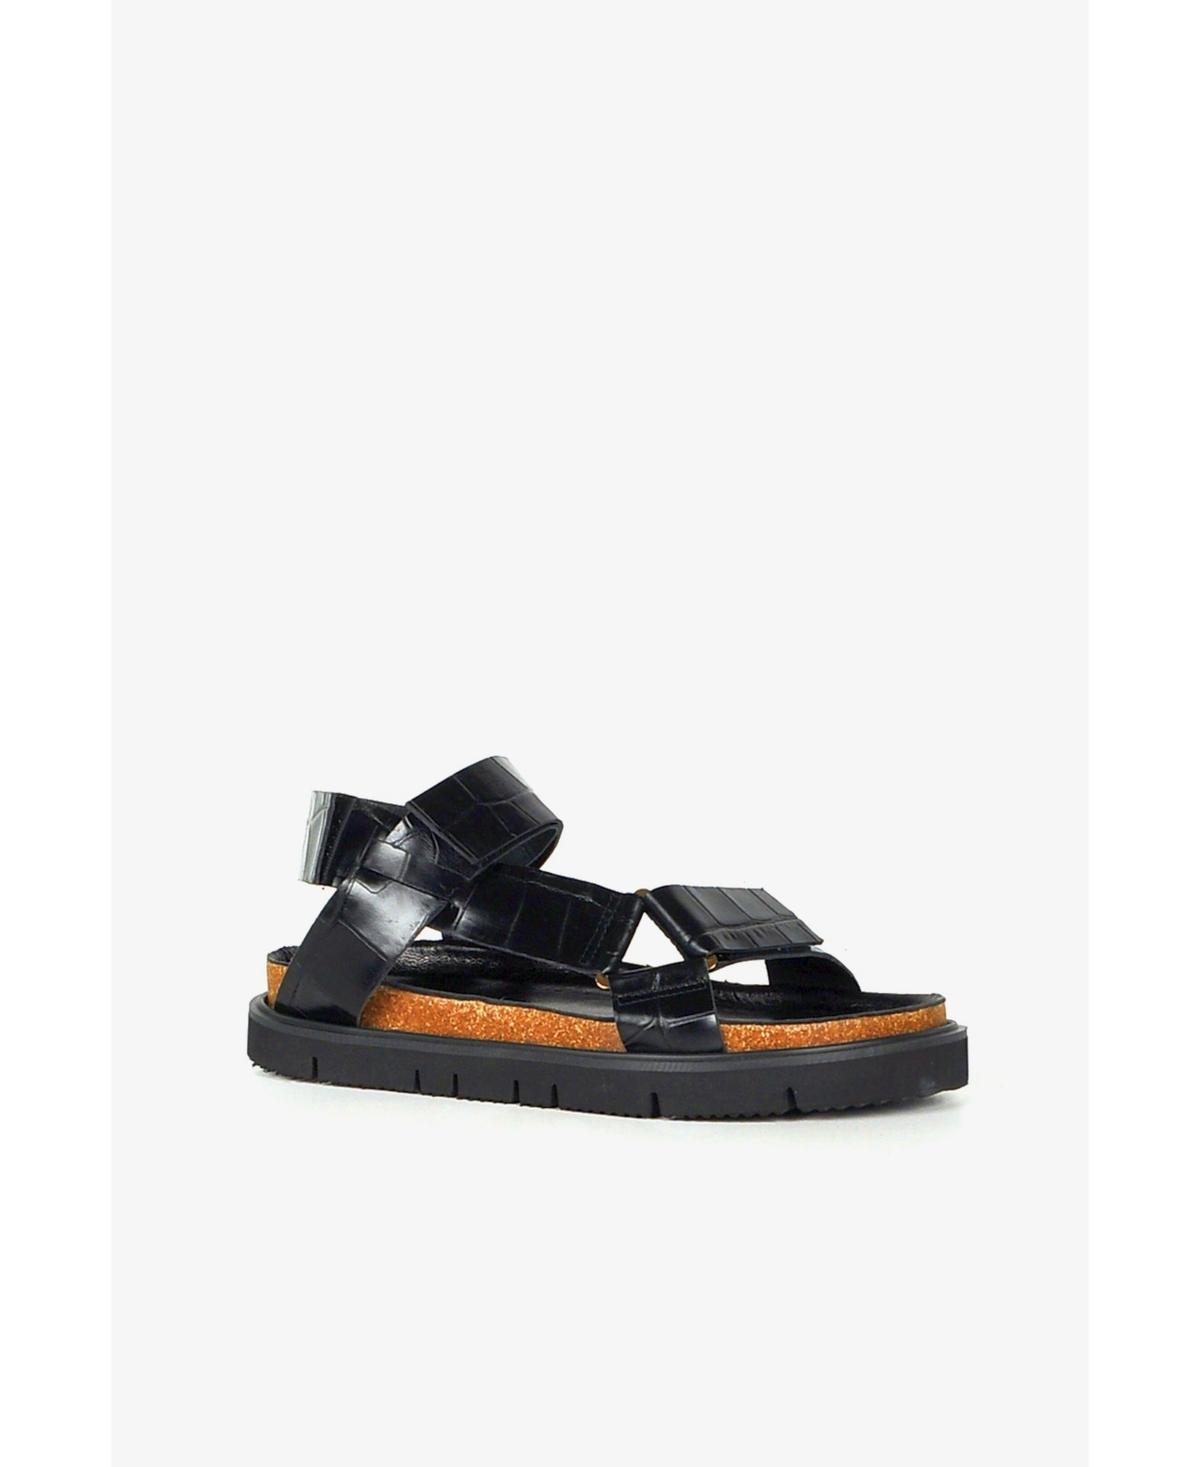 Women's Pressed Croc Lowform Flat Sandal Women's Shoes